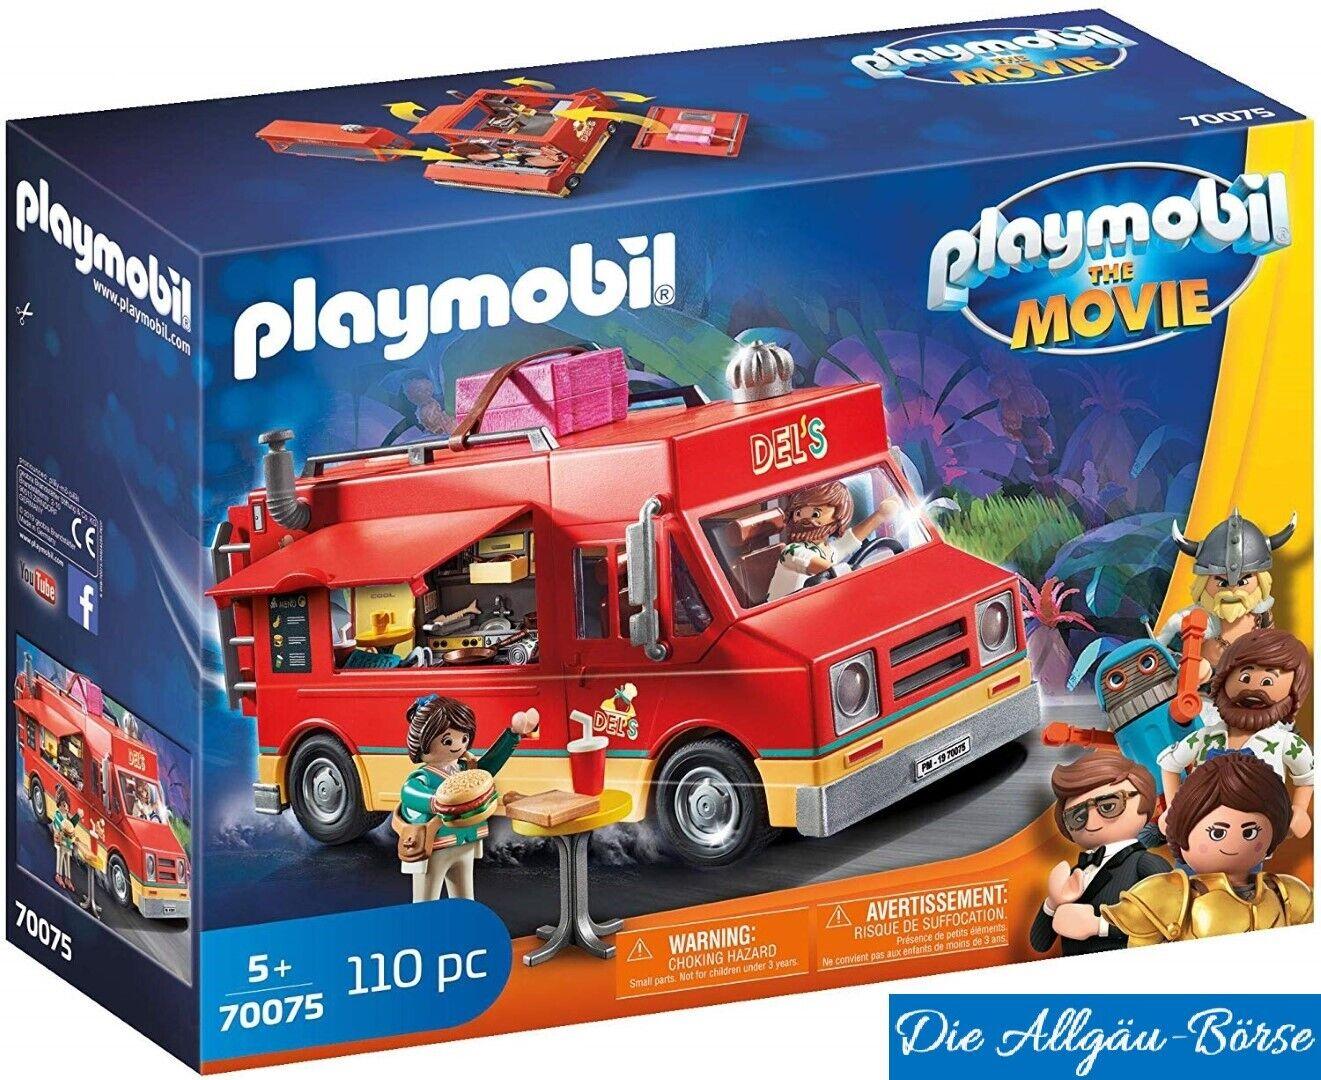 Playmobil 70075 Del `S Food Camion il Film Spuntino Autocarro